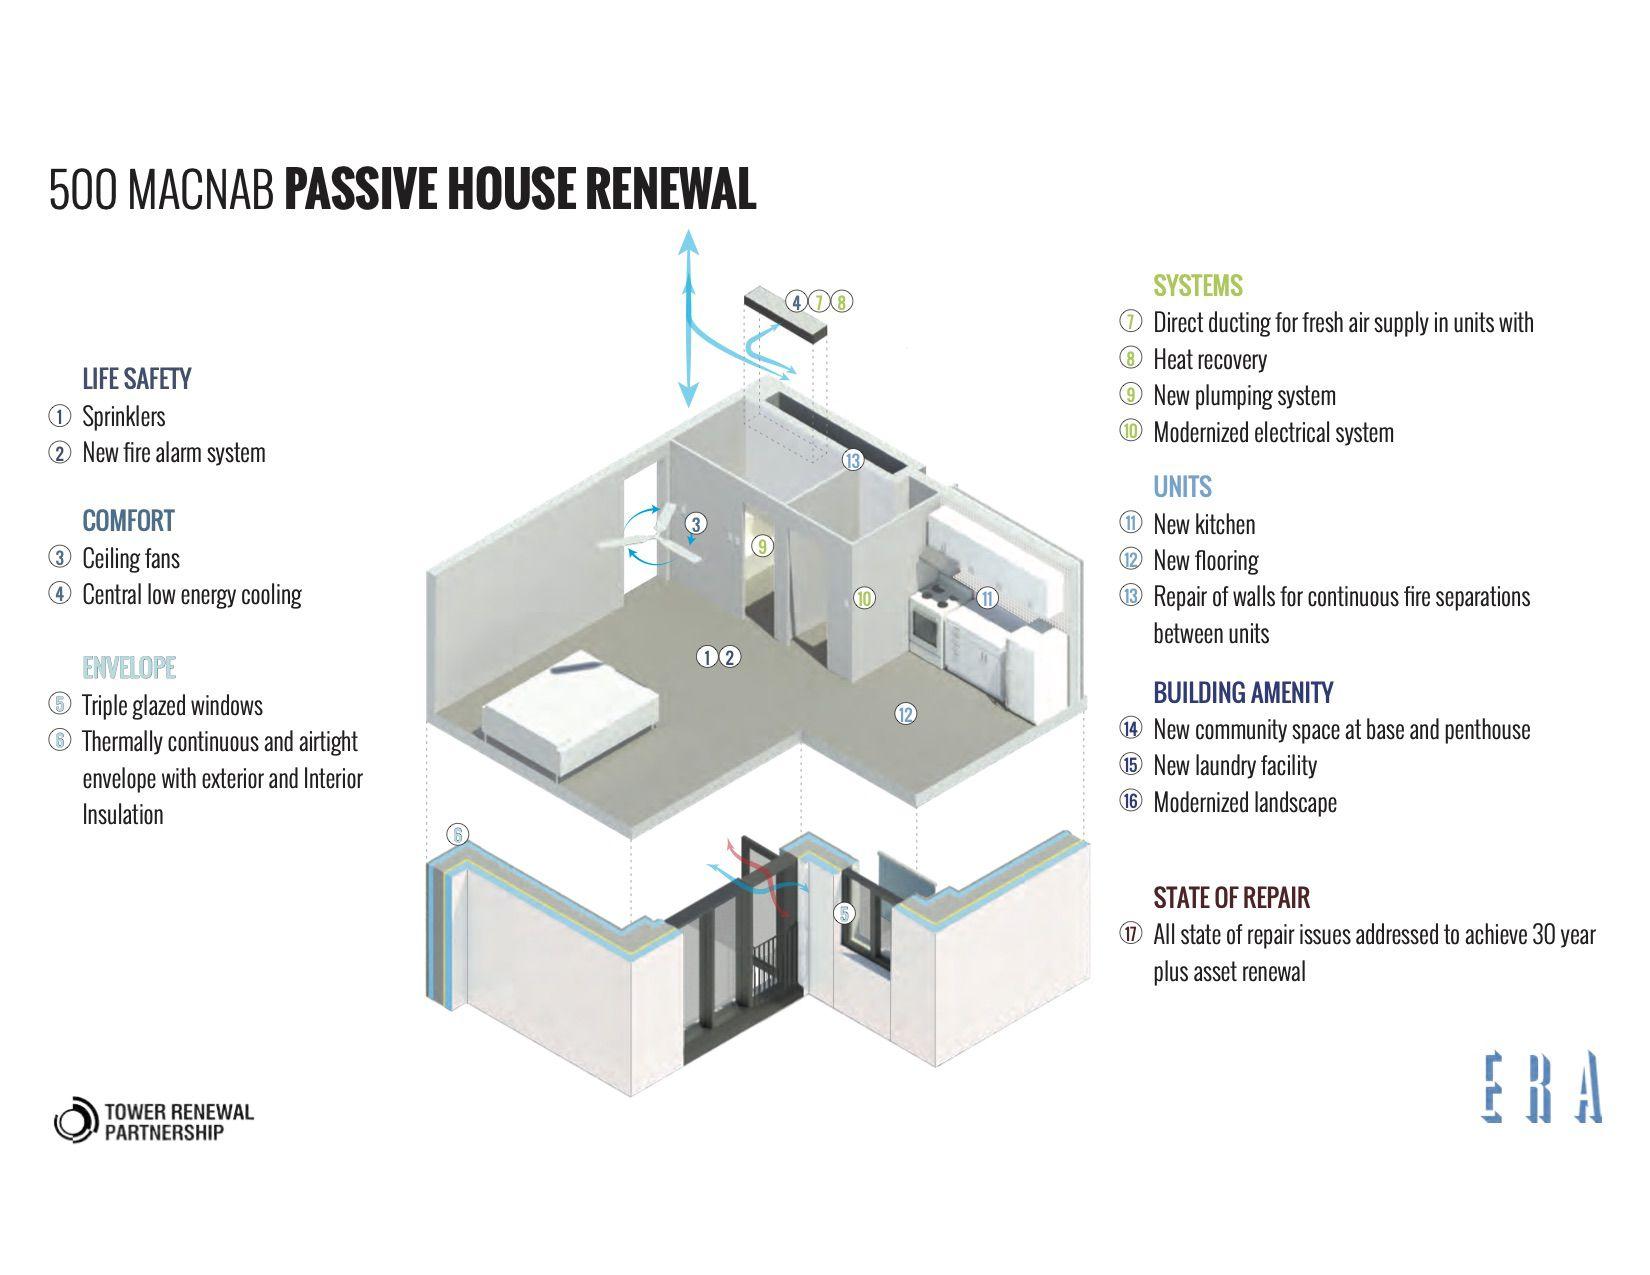 Passive House Renewal